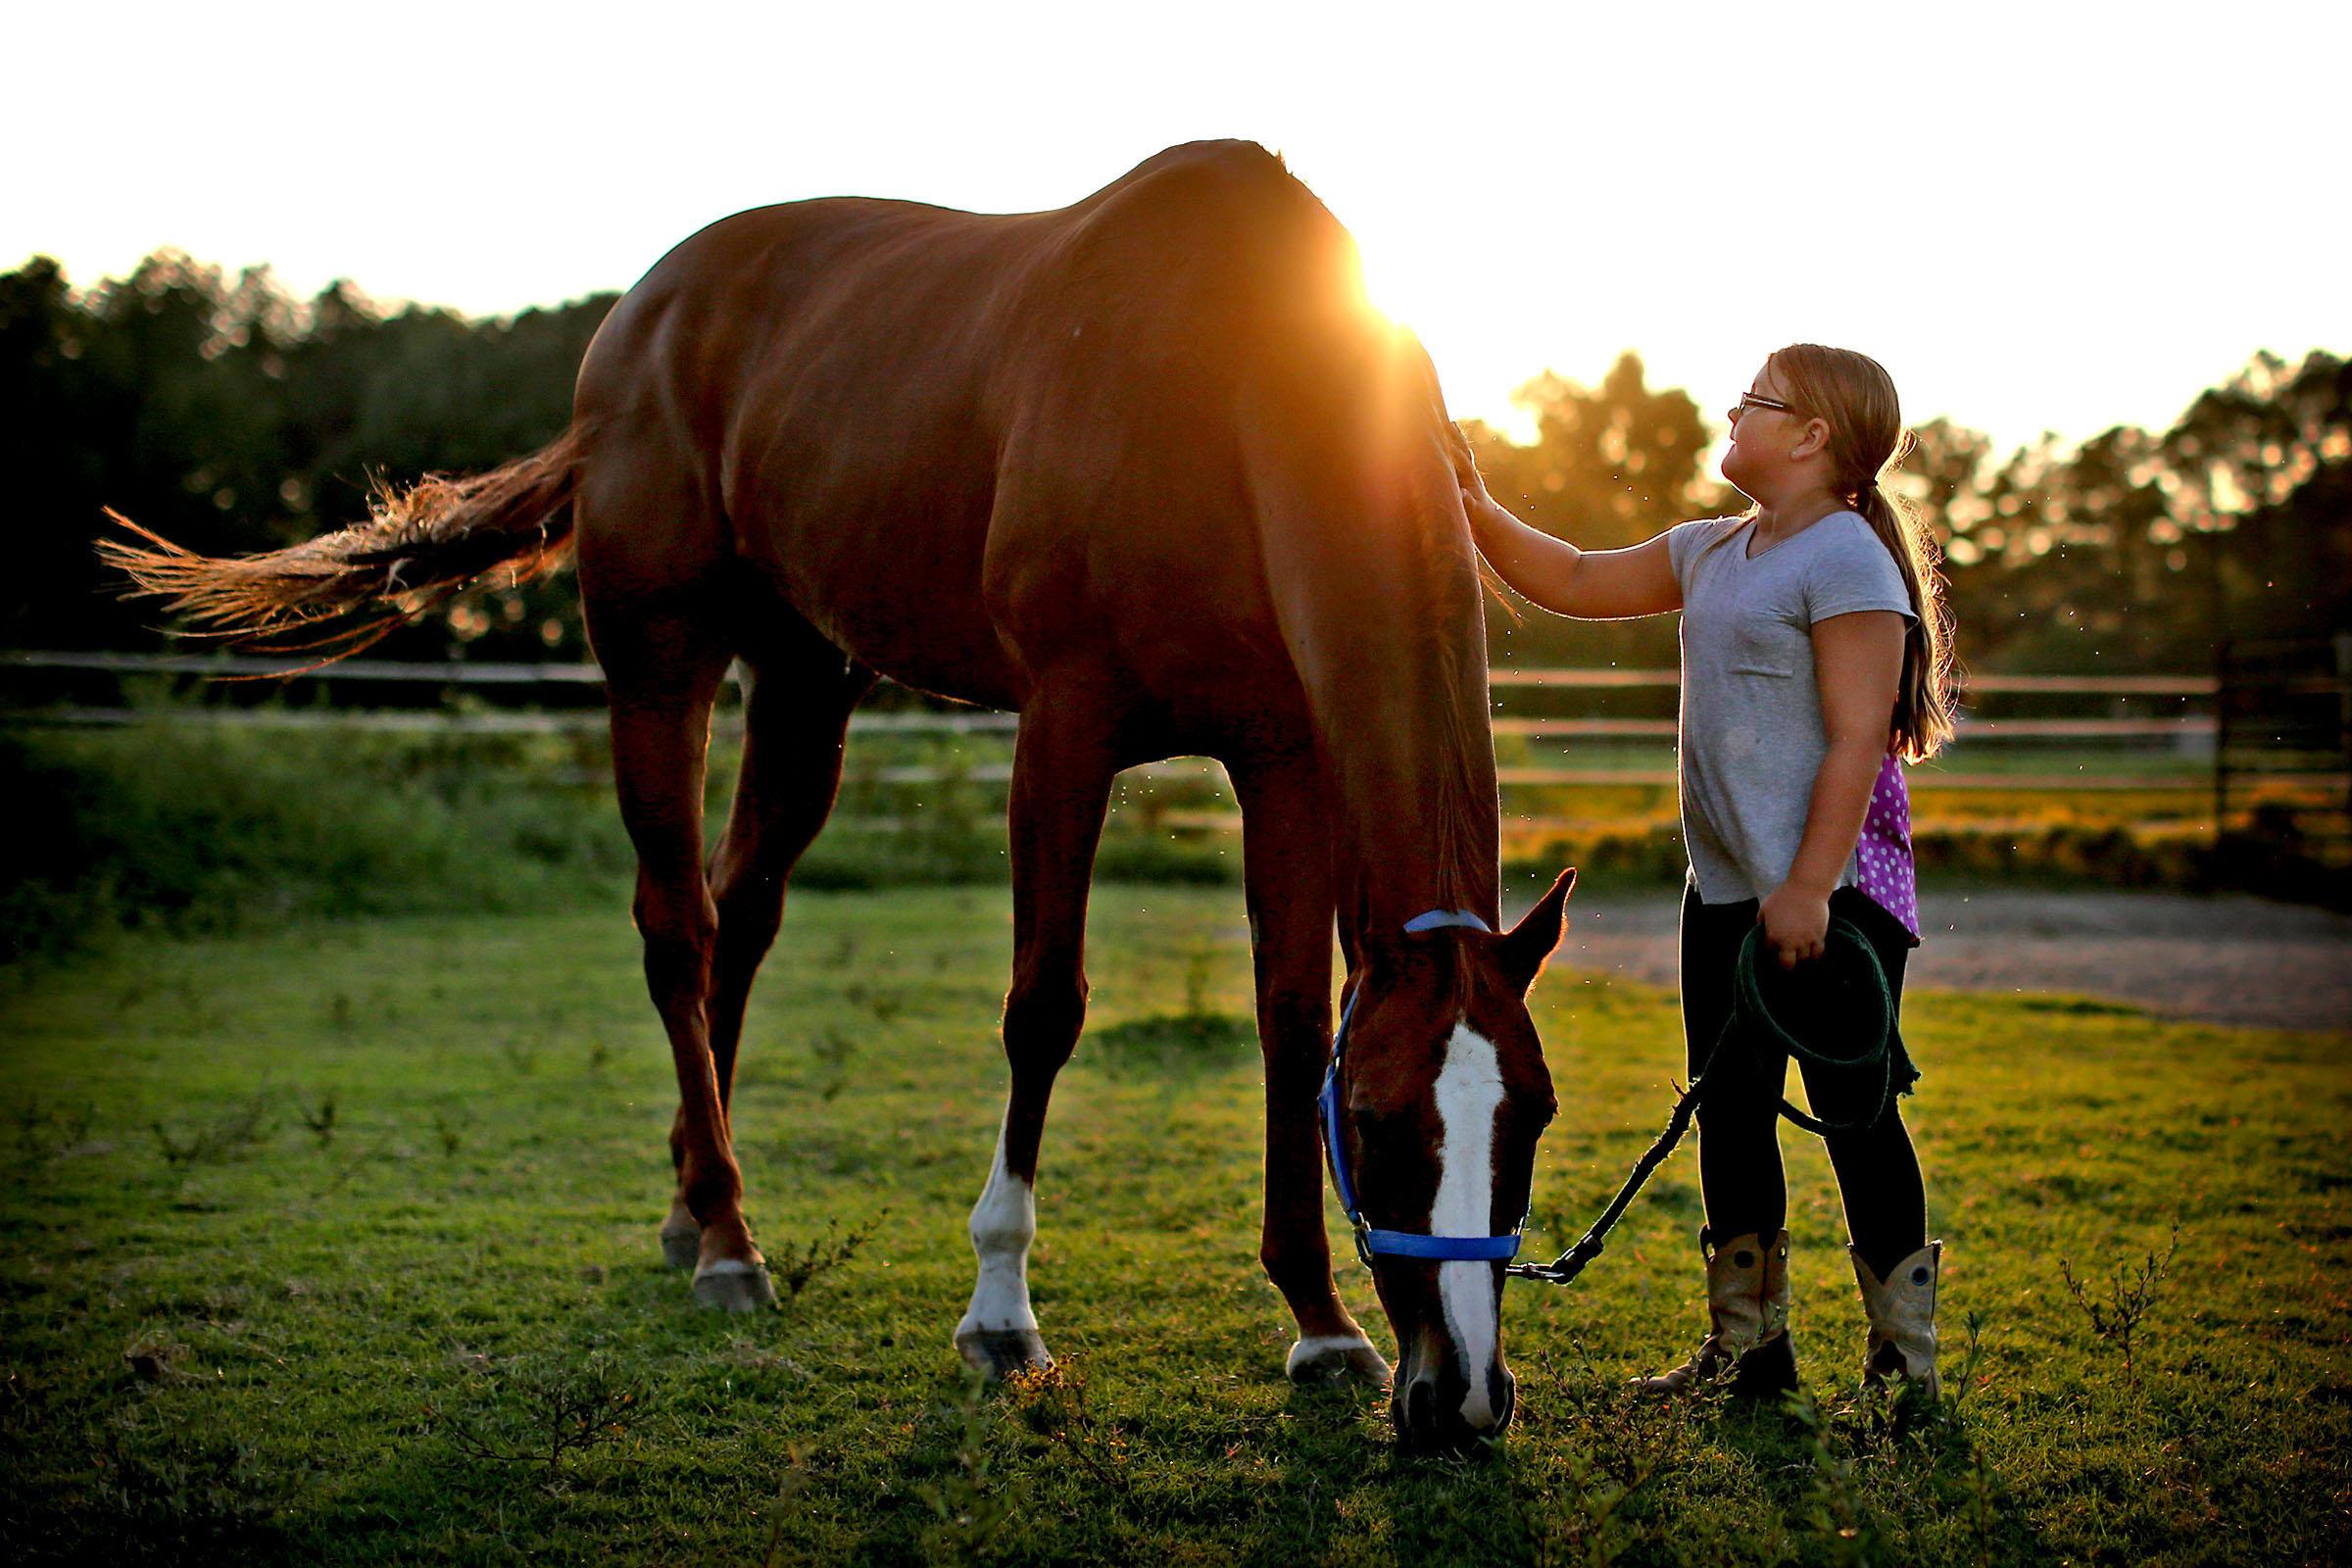 091915_HorseFeed01.JPG